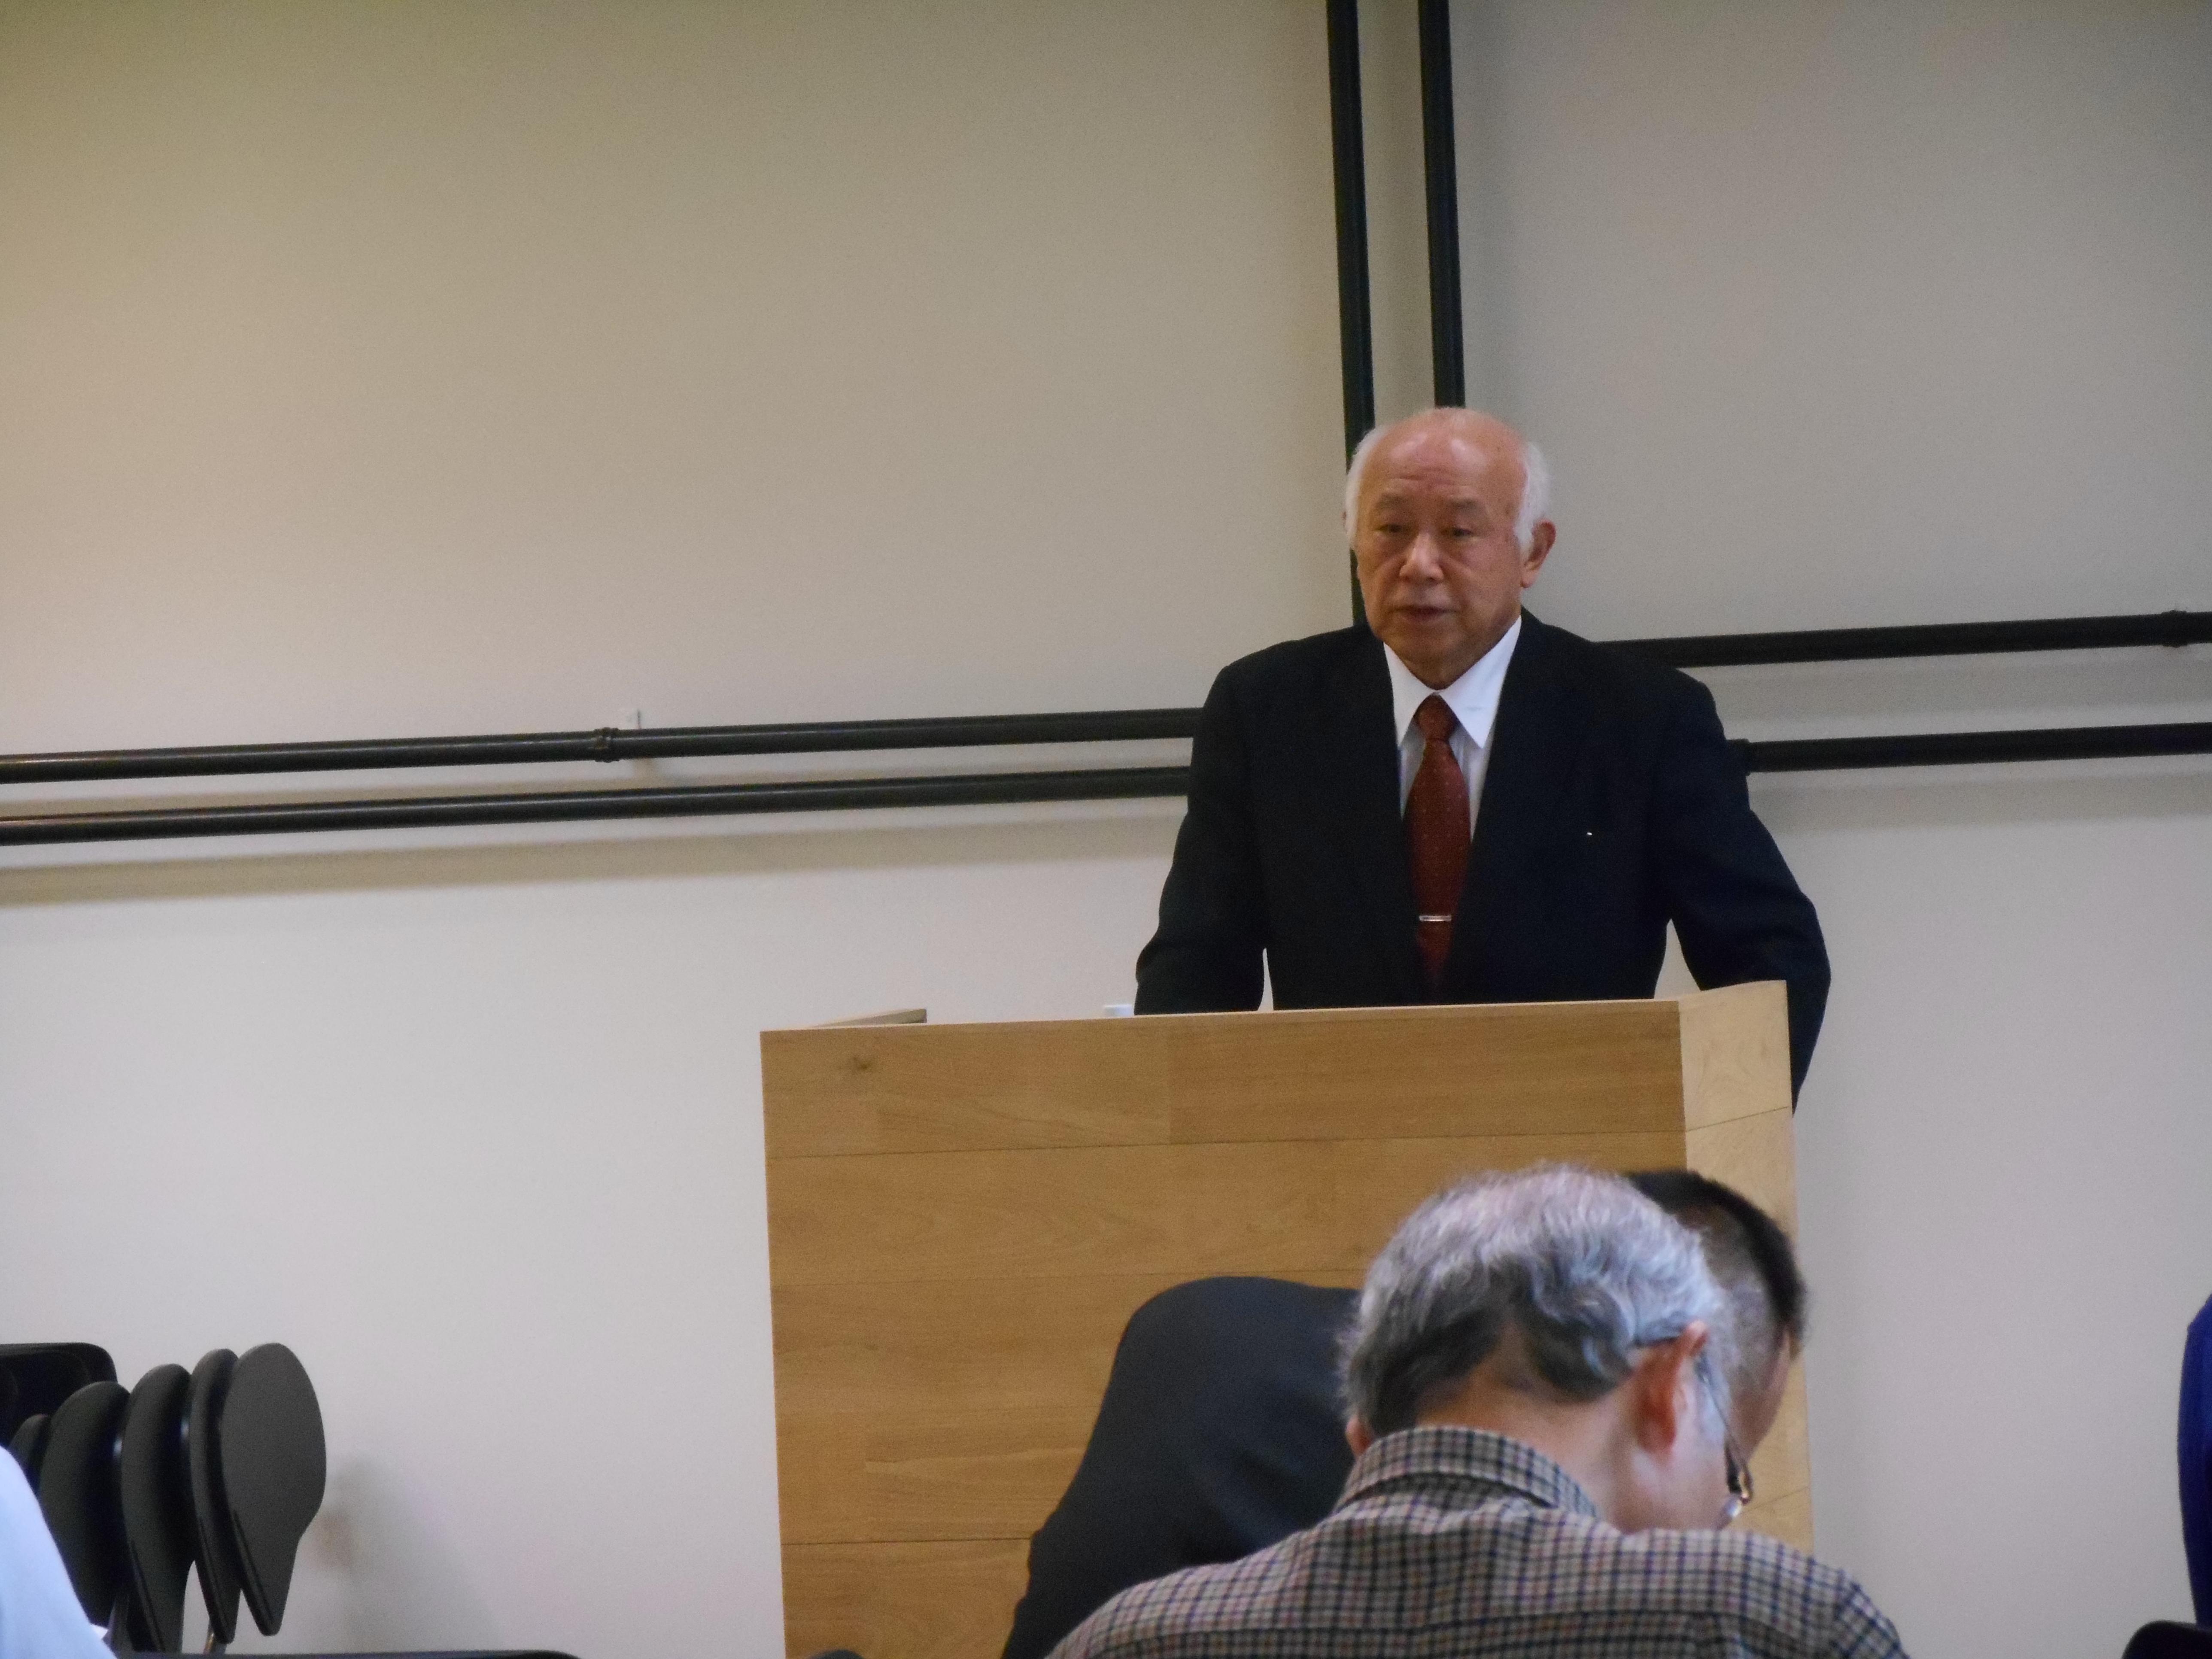 DSCN3707 - 2017年2月4日東京思風塾開催